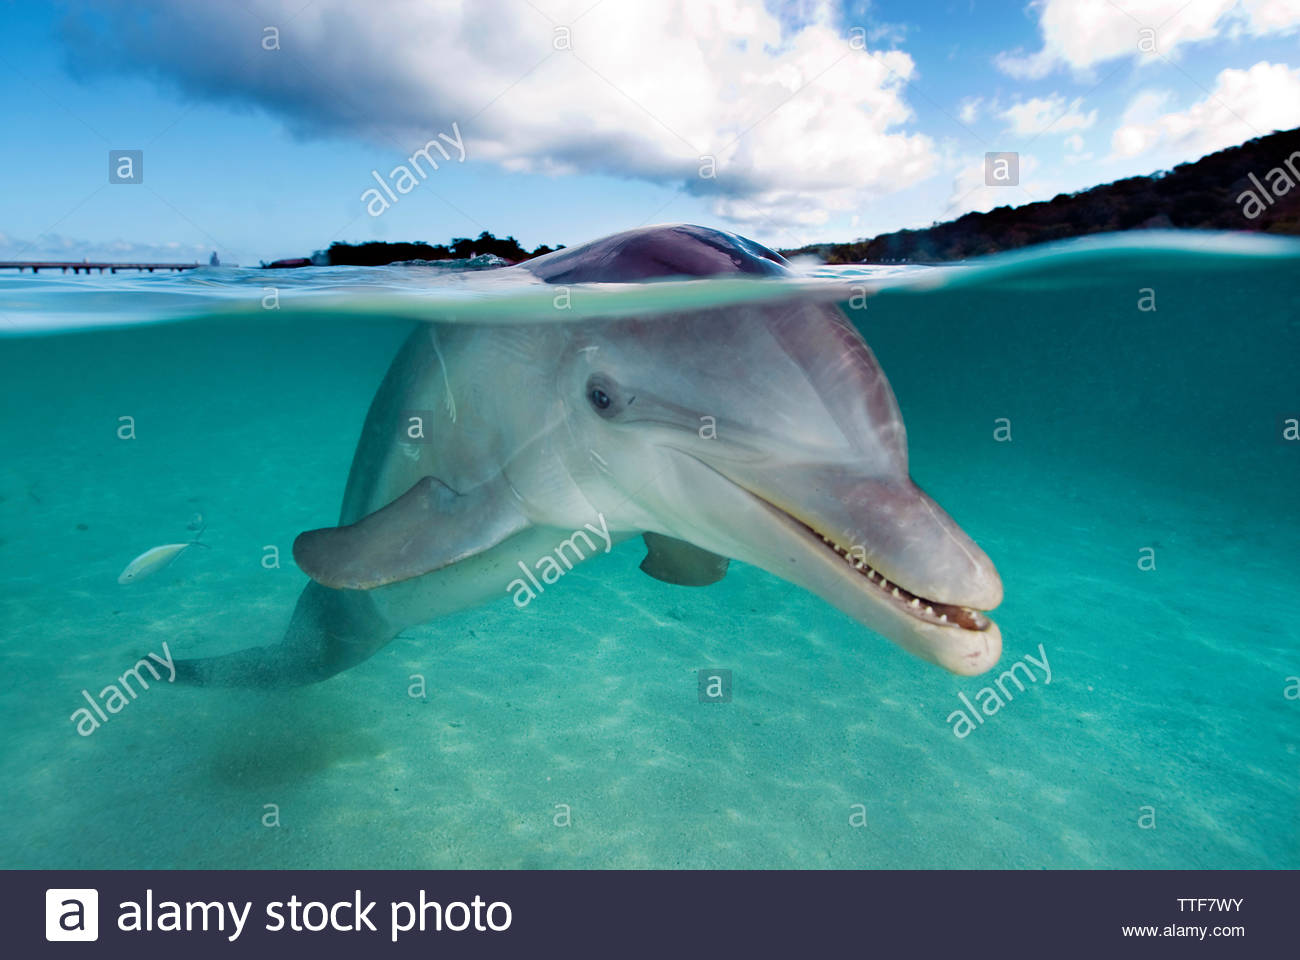 Bottlenose dolphin (Tursiops truncatus), split level, over under water, Roatan island, Bay islands, Honduras - Stock Image